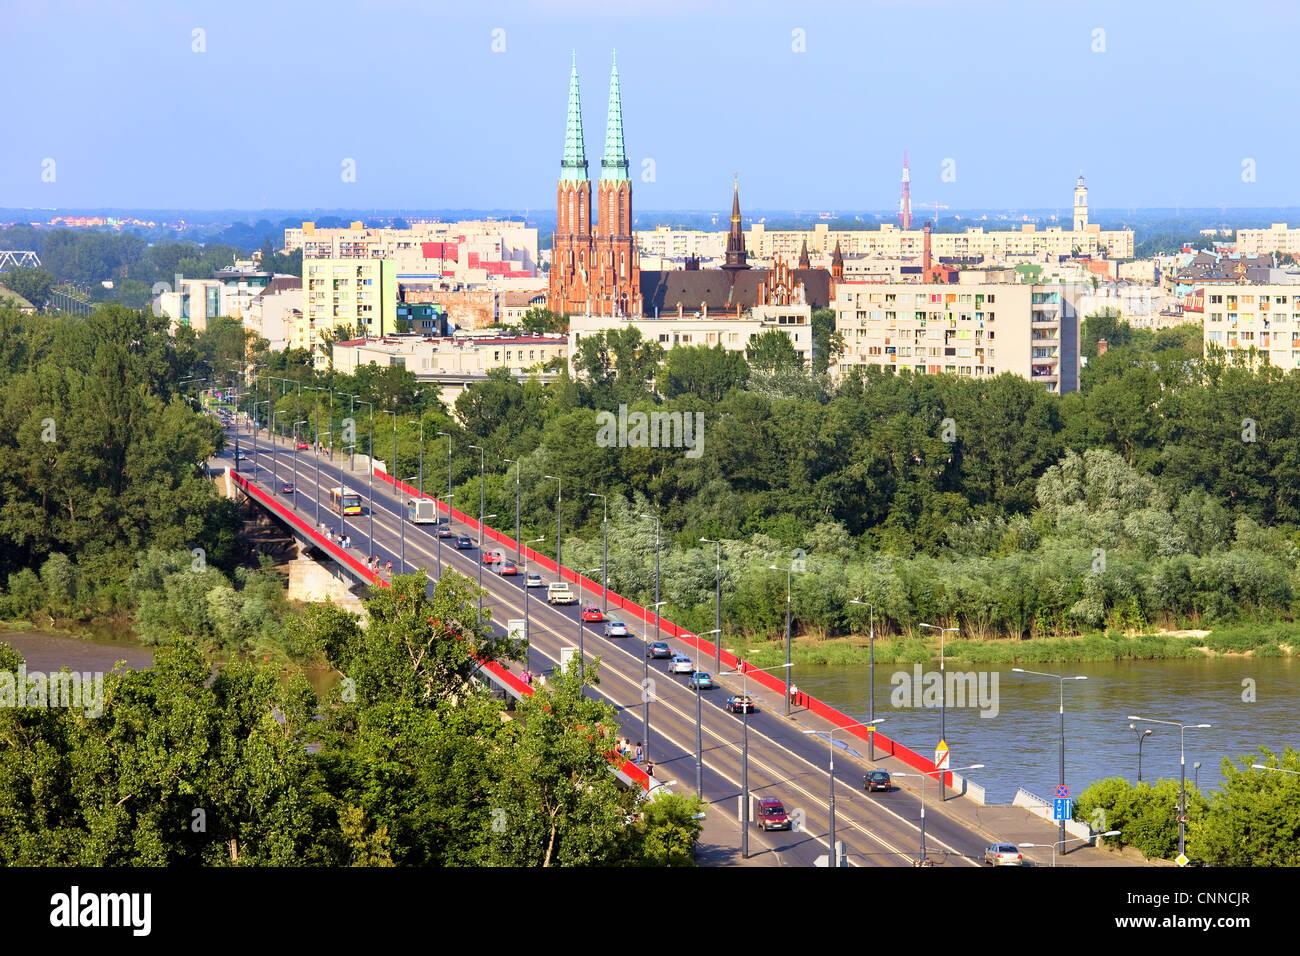 Cityscape of Warsaw, Poland, Slasko-Dabrowski bridge, Praga district behind the Vistula river - Stock Image